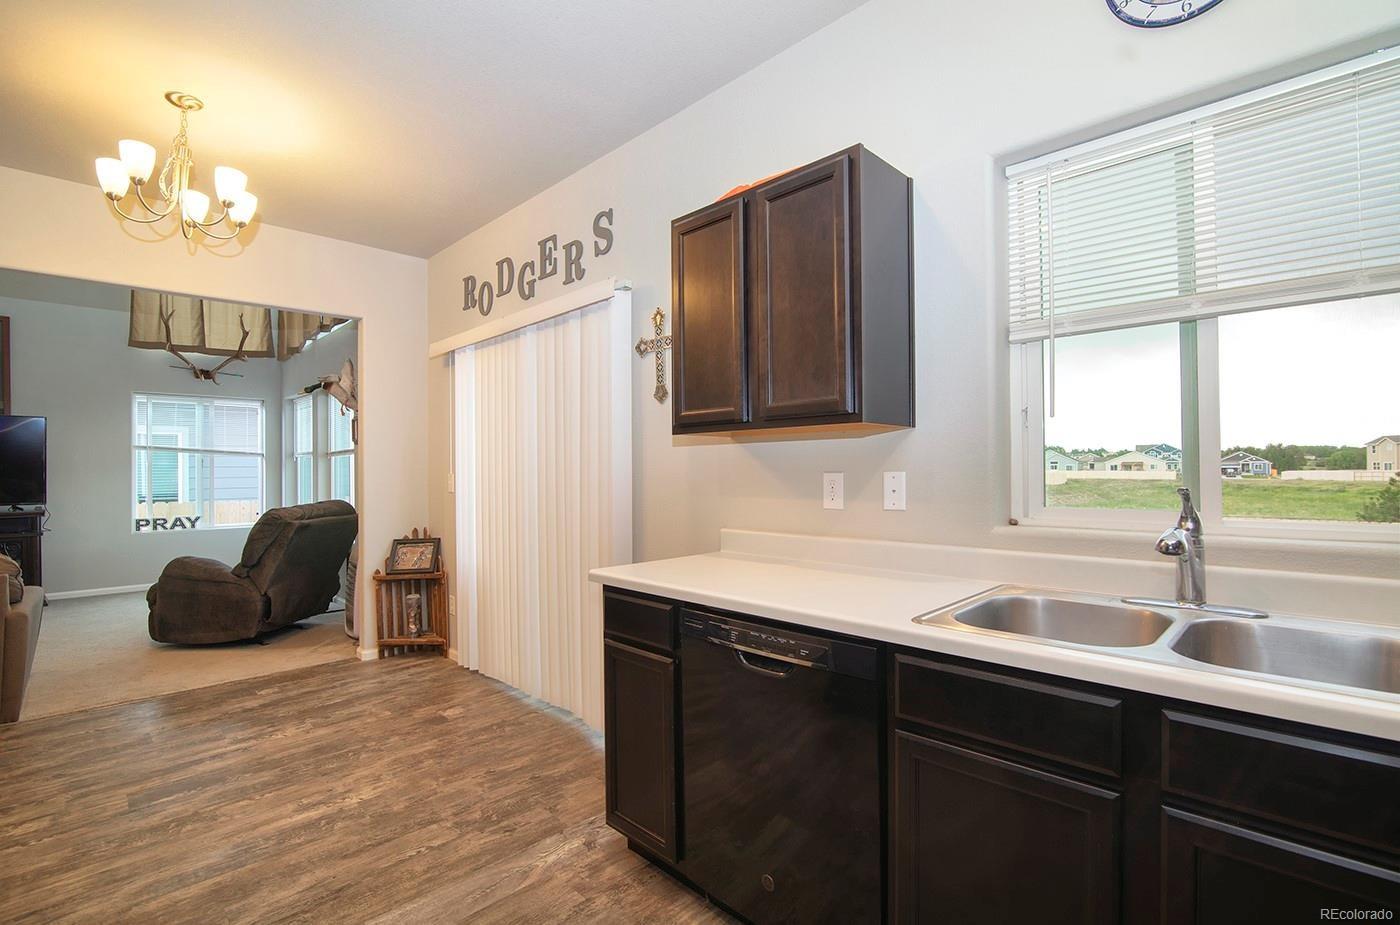 MLS# 7058019 - 8 - 9615 Rubicon Drive, Colorado Springs, CO 80925